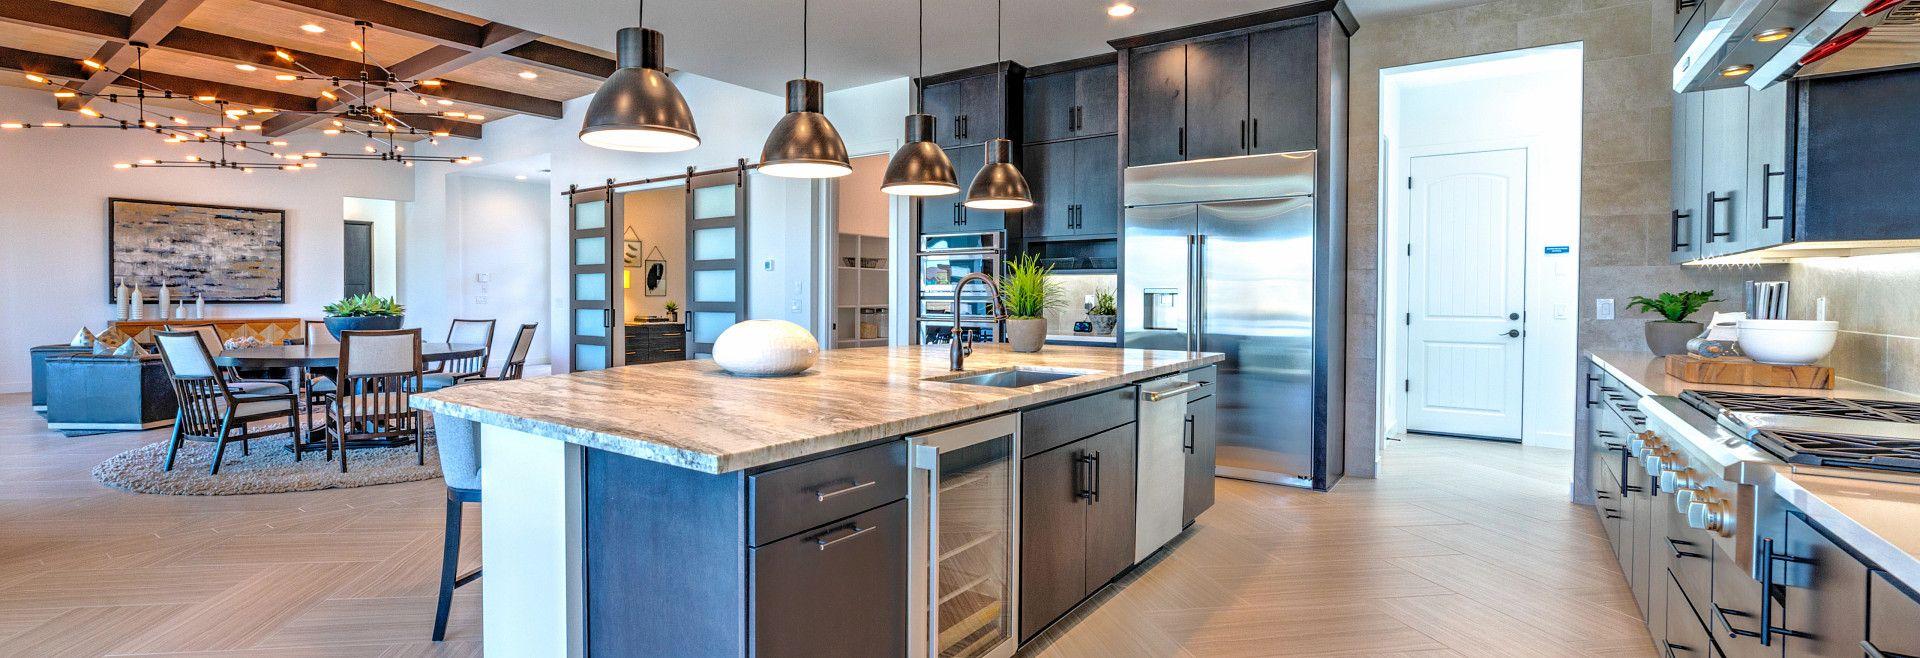 Residence 3 Model Kitchen:Residence 3 Kitchen